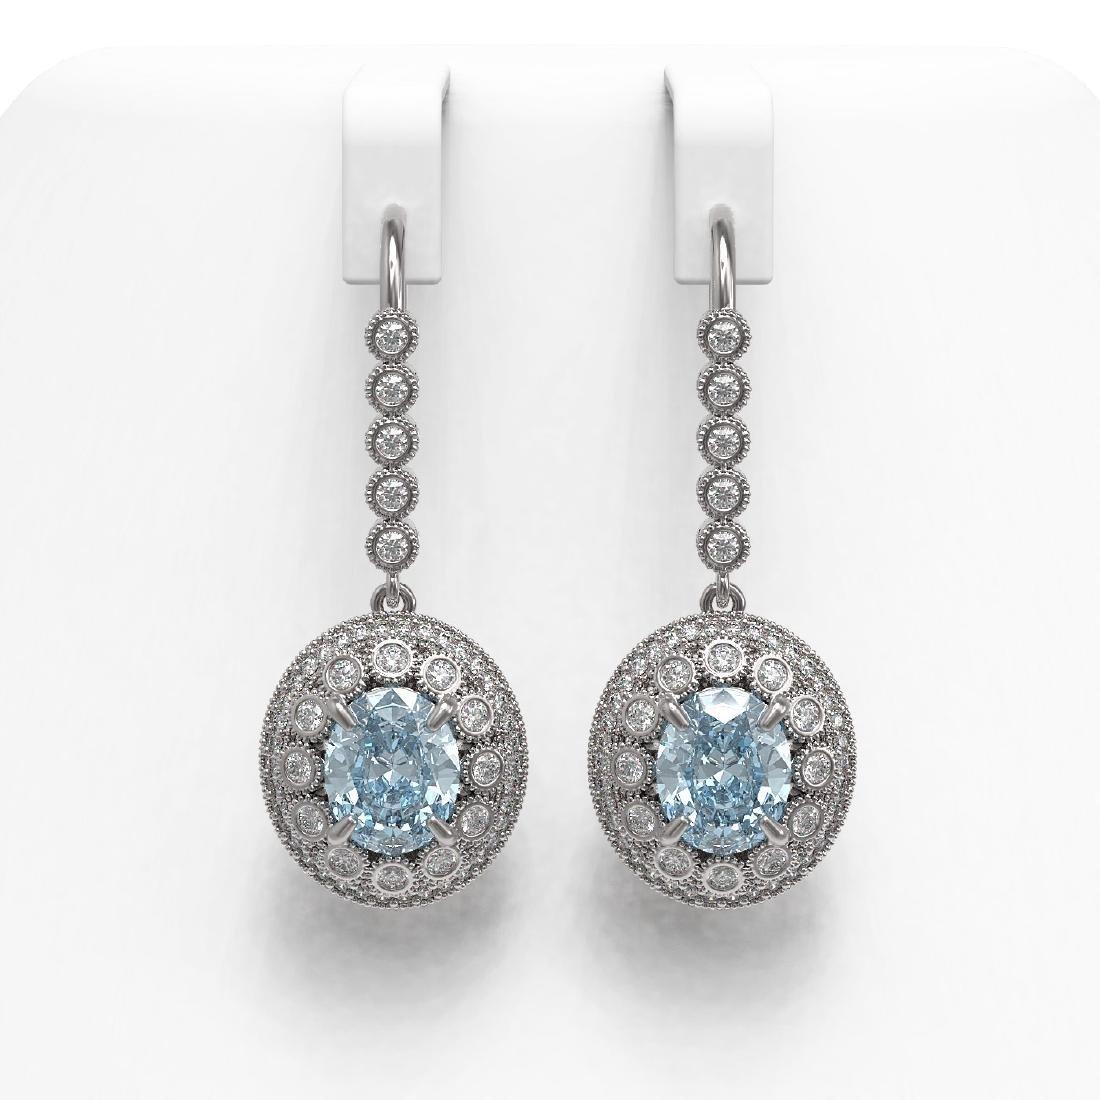 7.65 ctw Aquamarine & Diamond Earrings 14K White Gold -